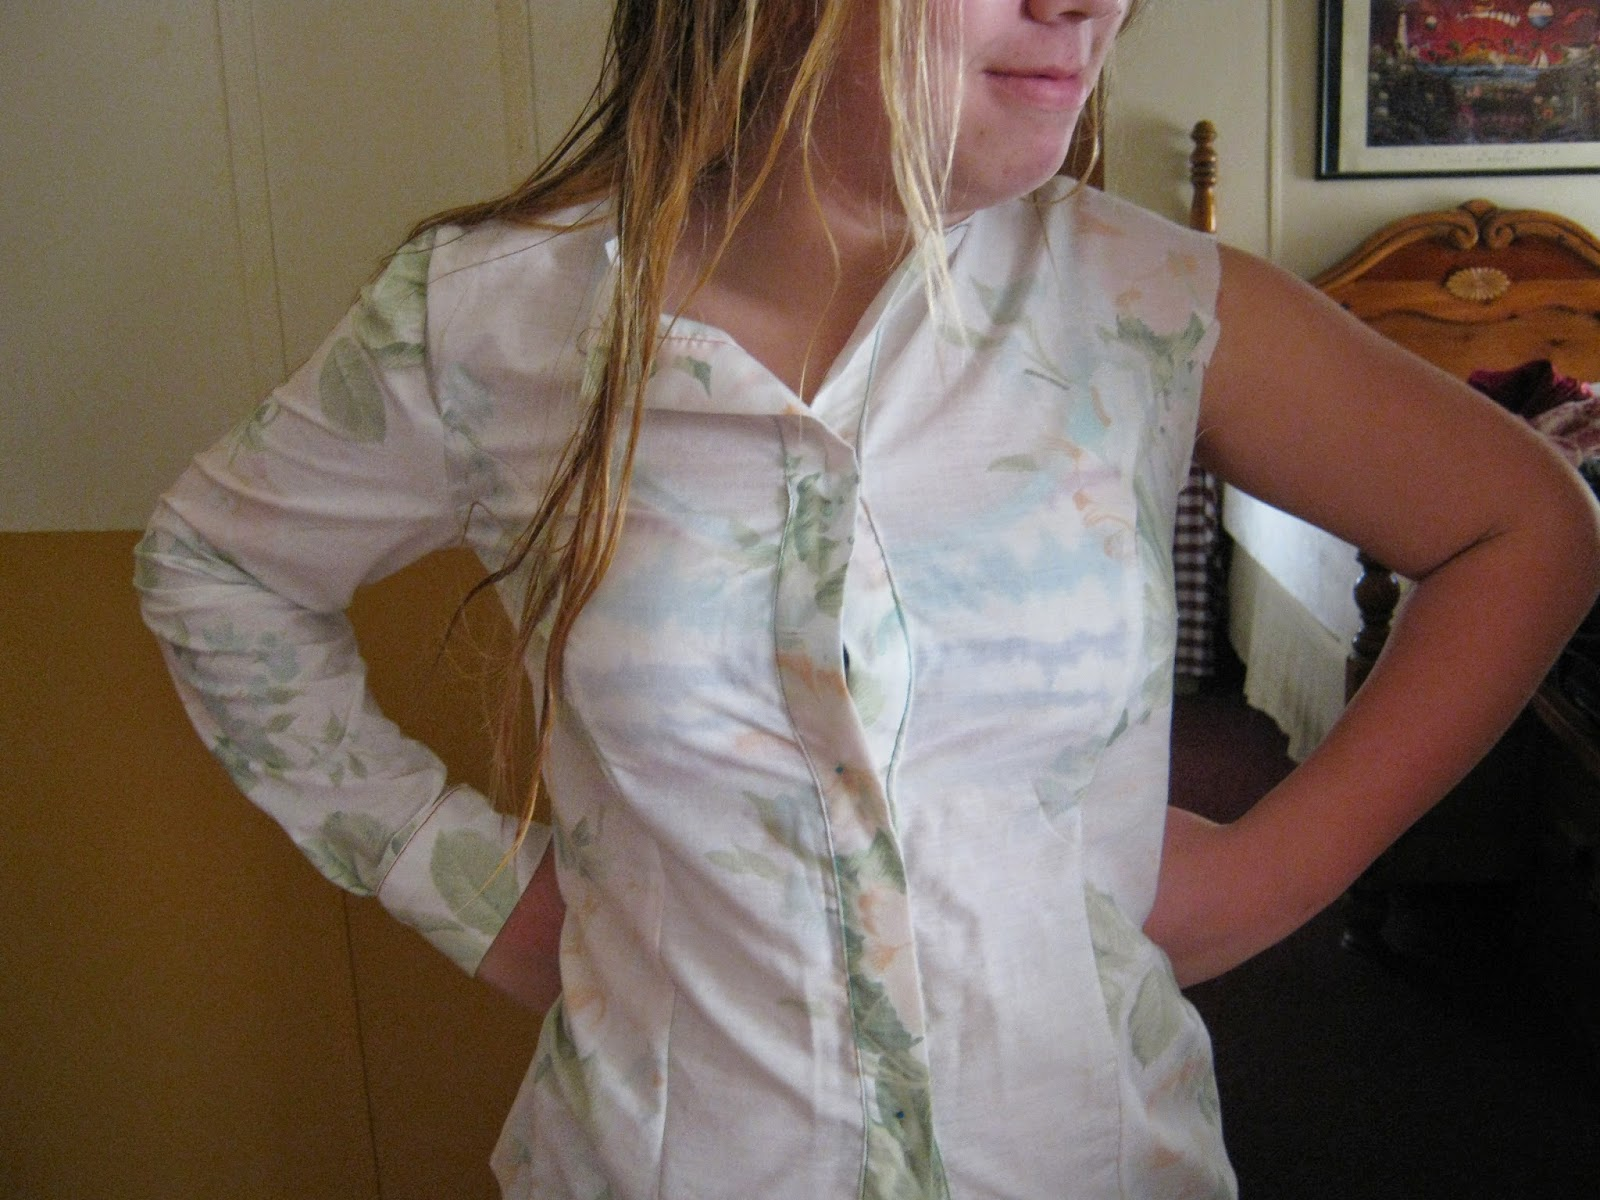 McCall 4922 Princess Seam Top Muslin www.sewplus.blogspot.com